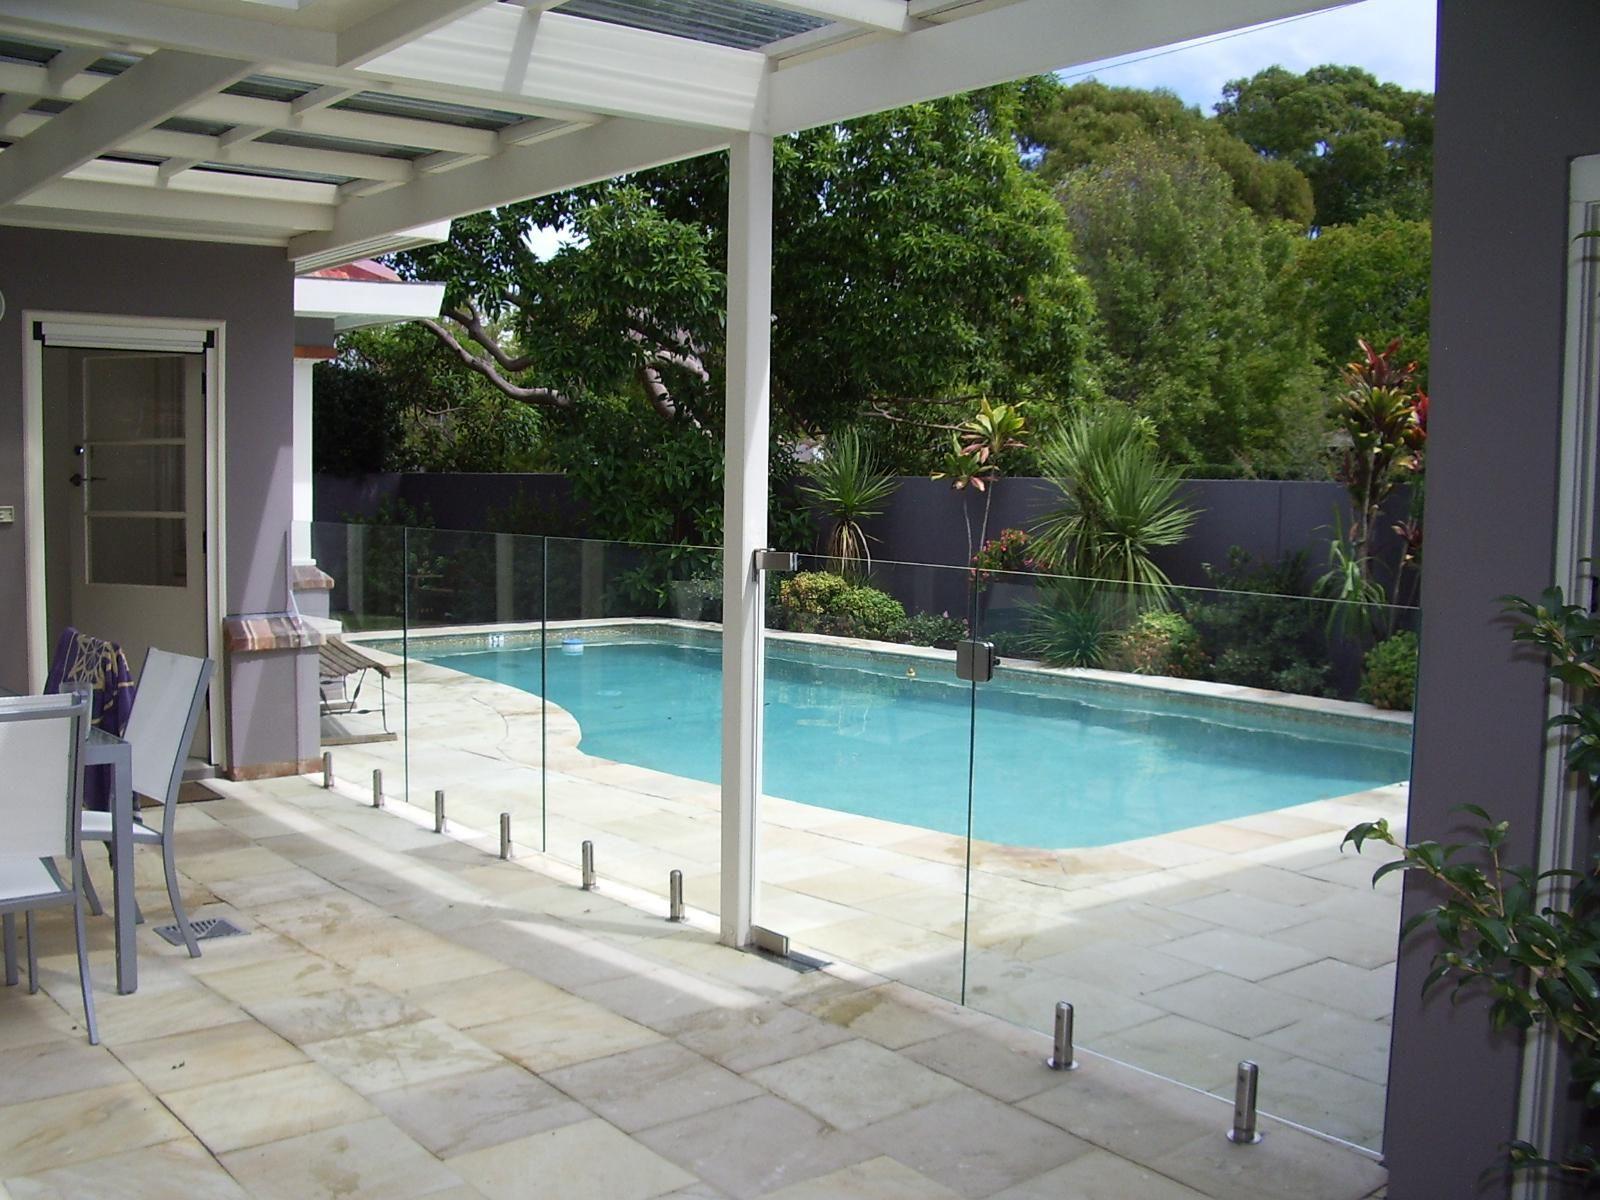 Plexi Glass Pool Barrier Pool Fence Glass Pool Fencing Backyard Fences